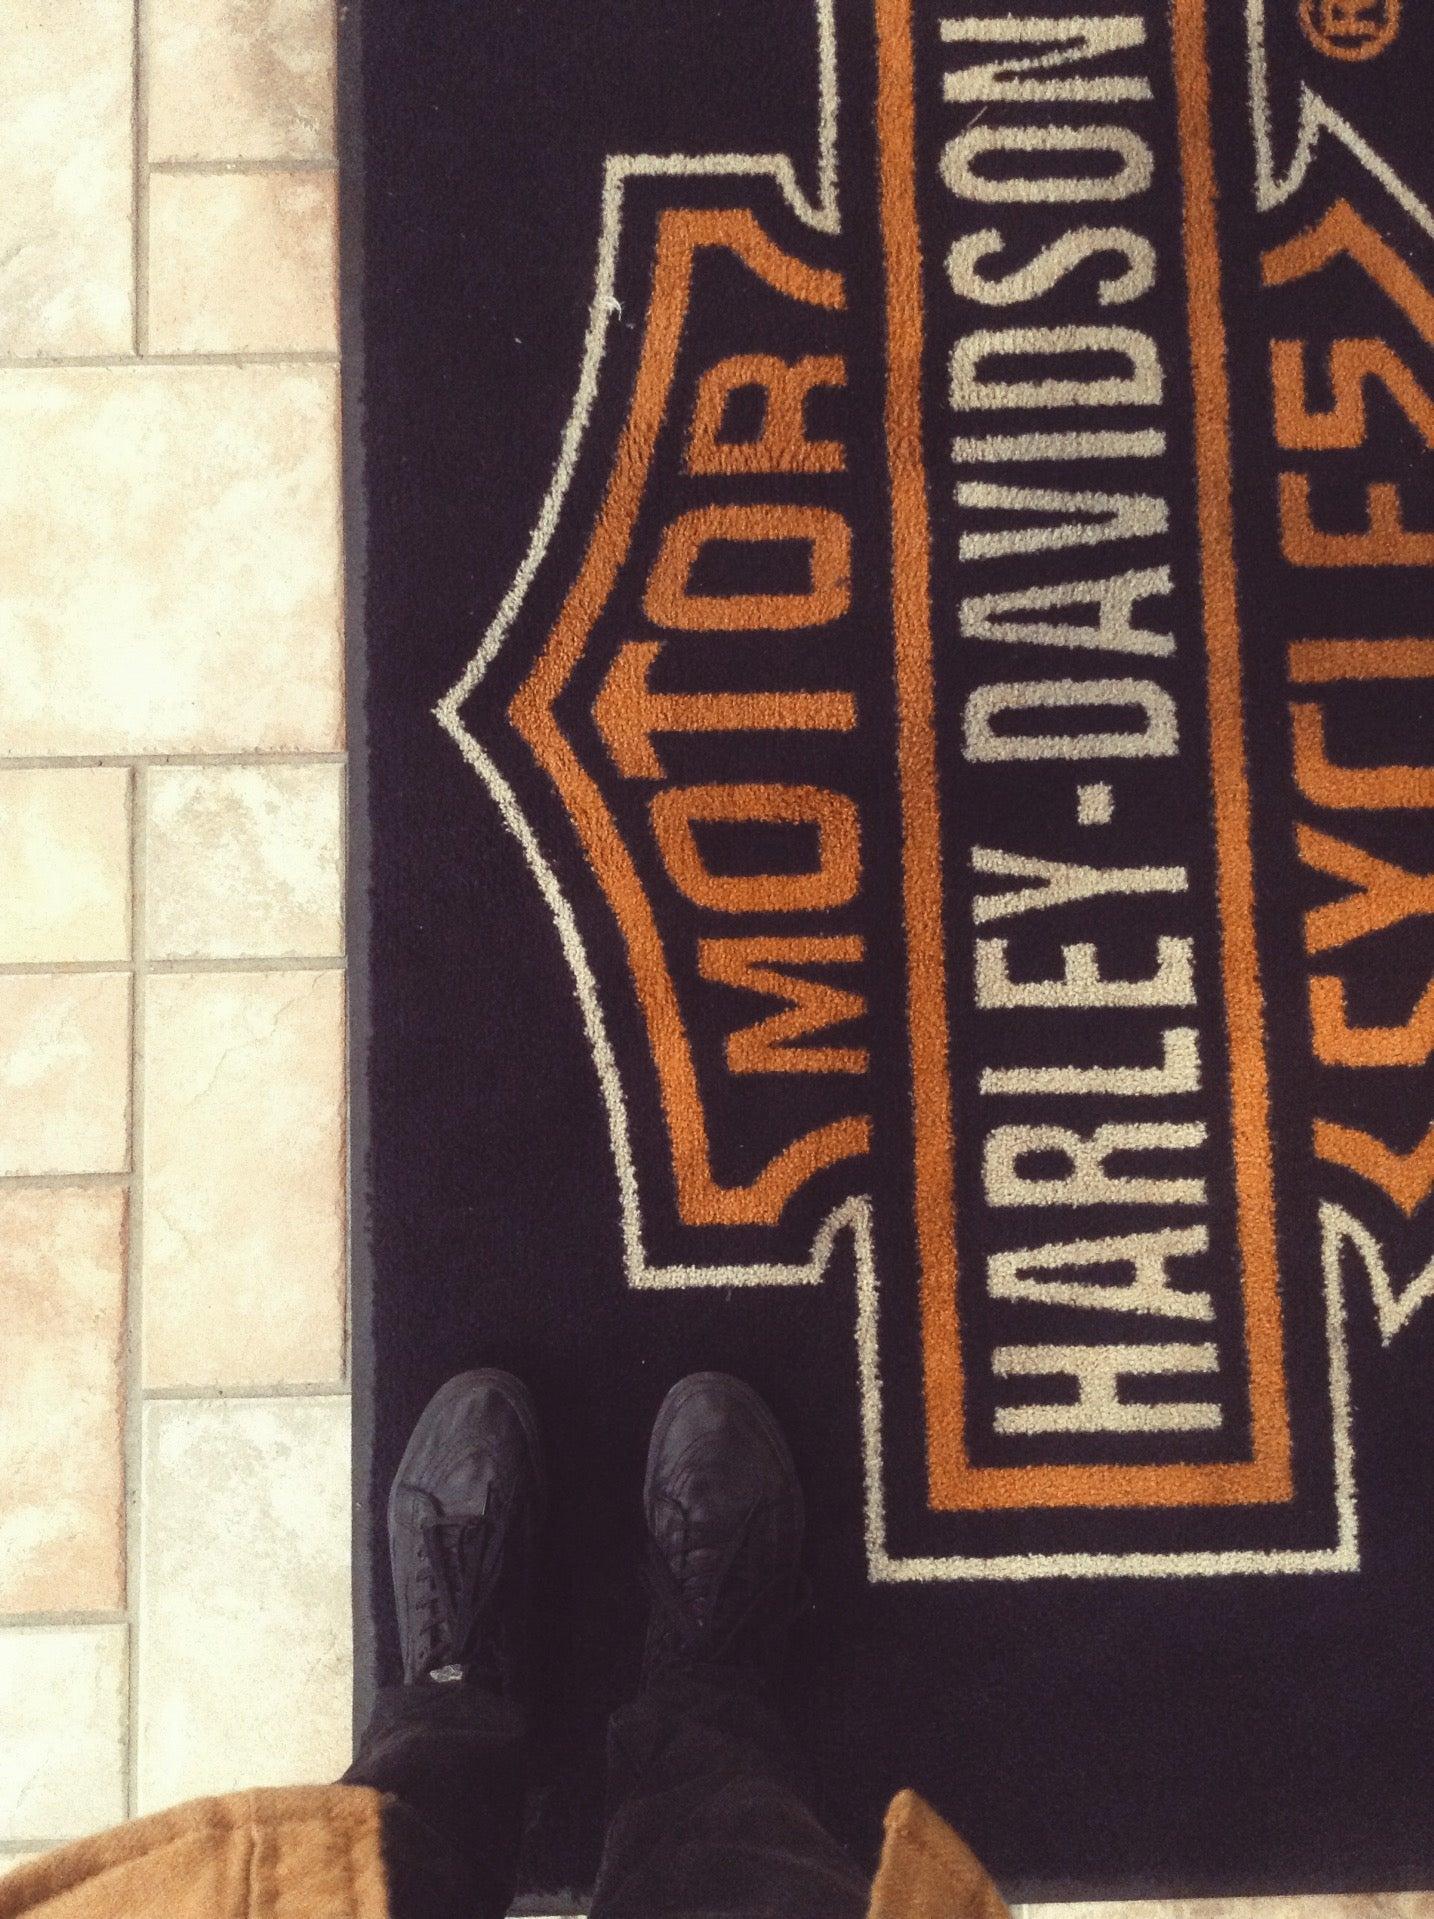 Harley-Davidson,harley davidson